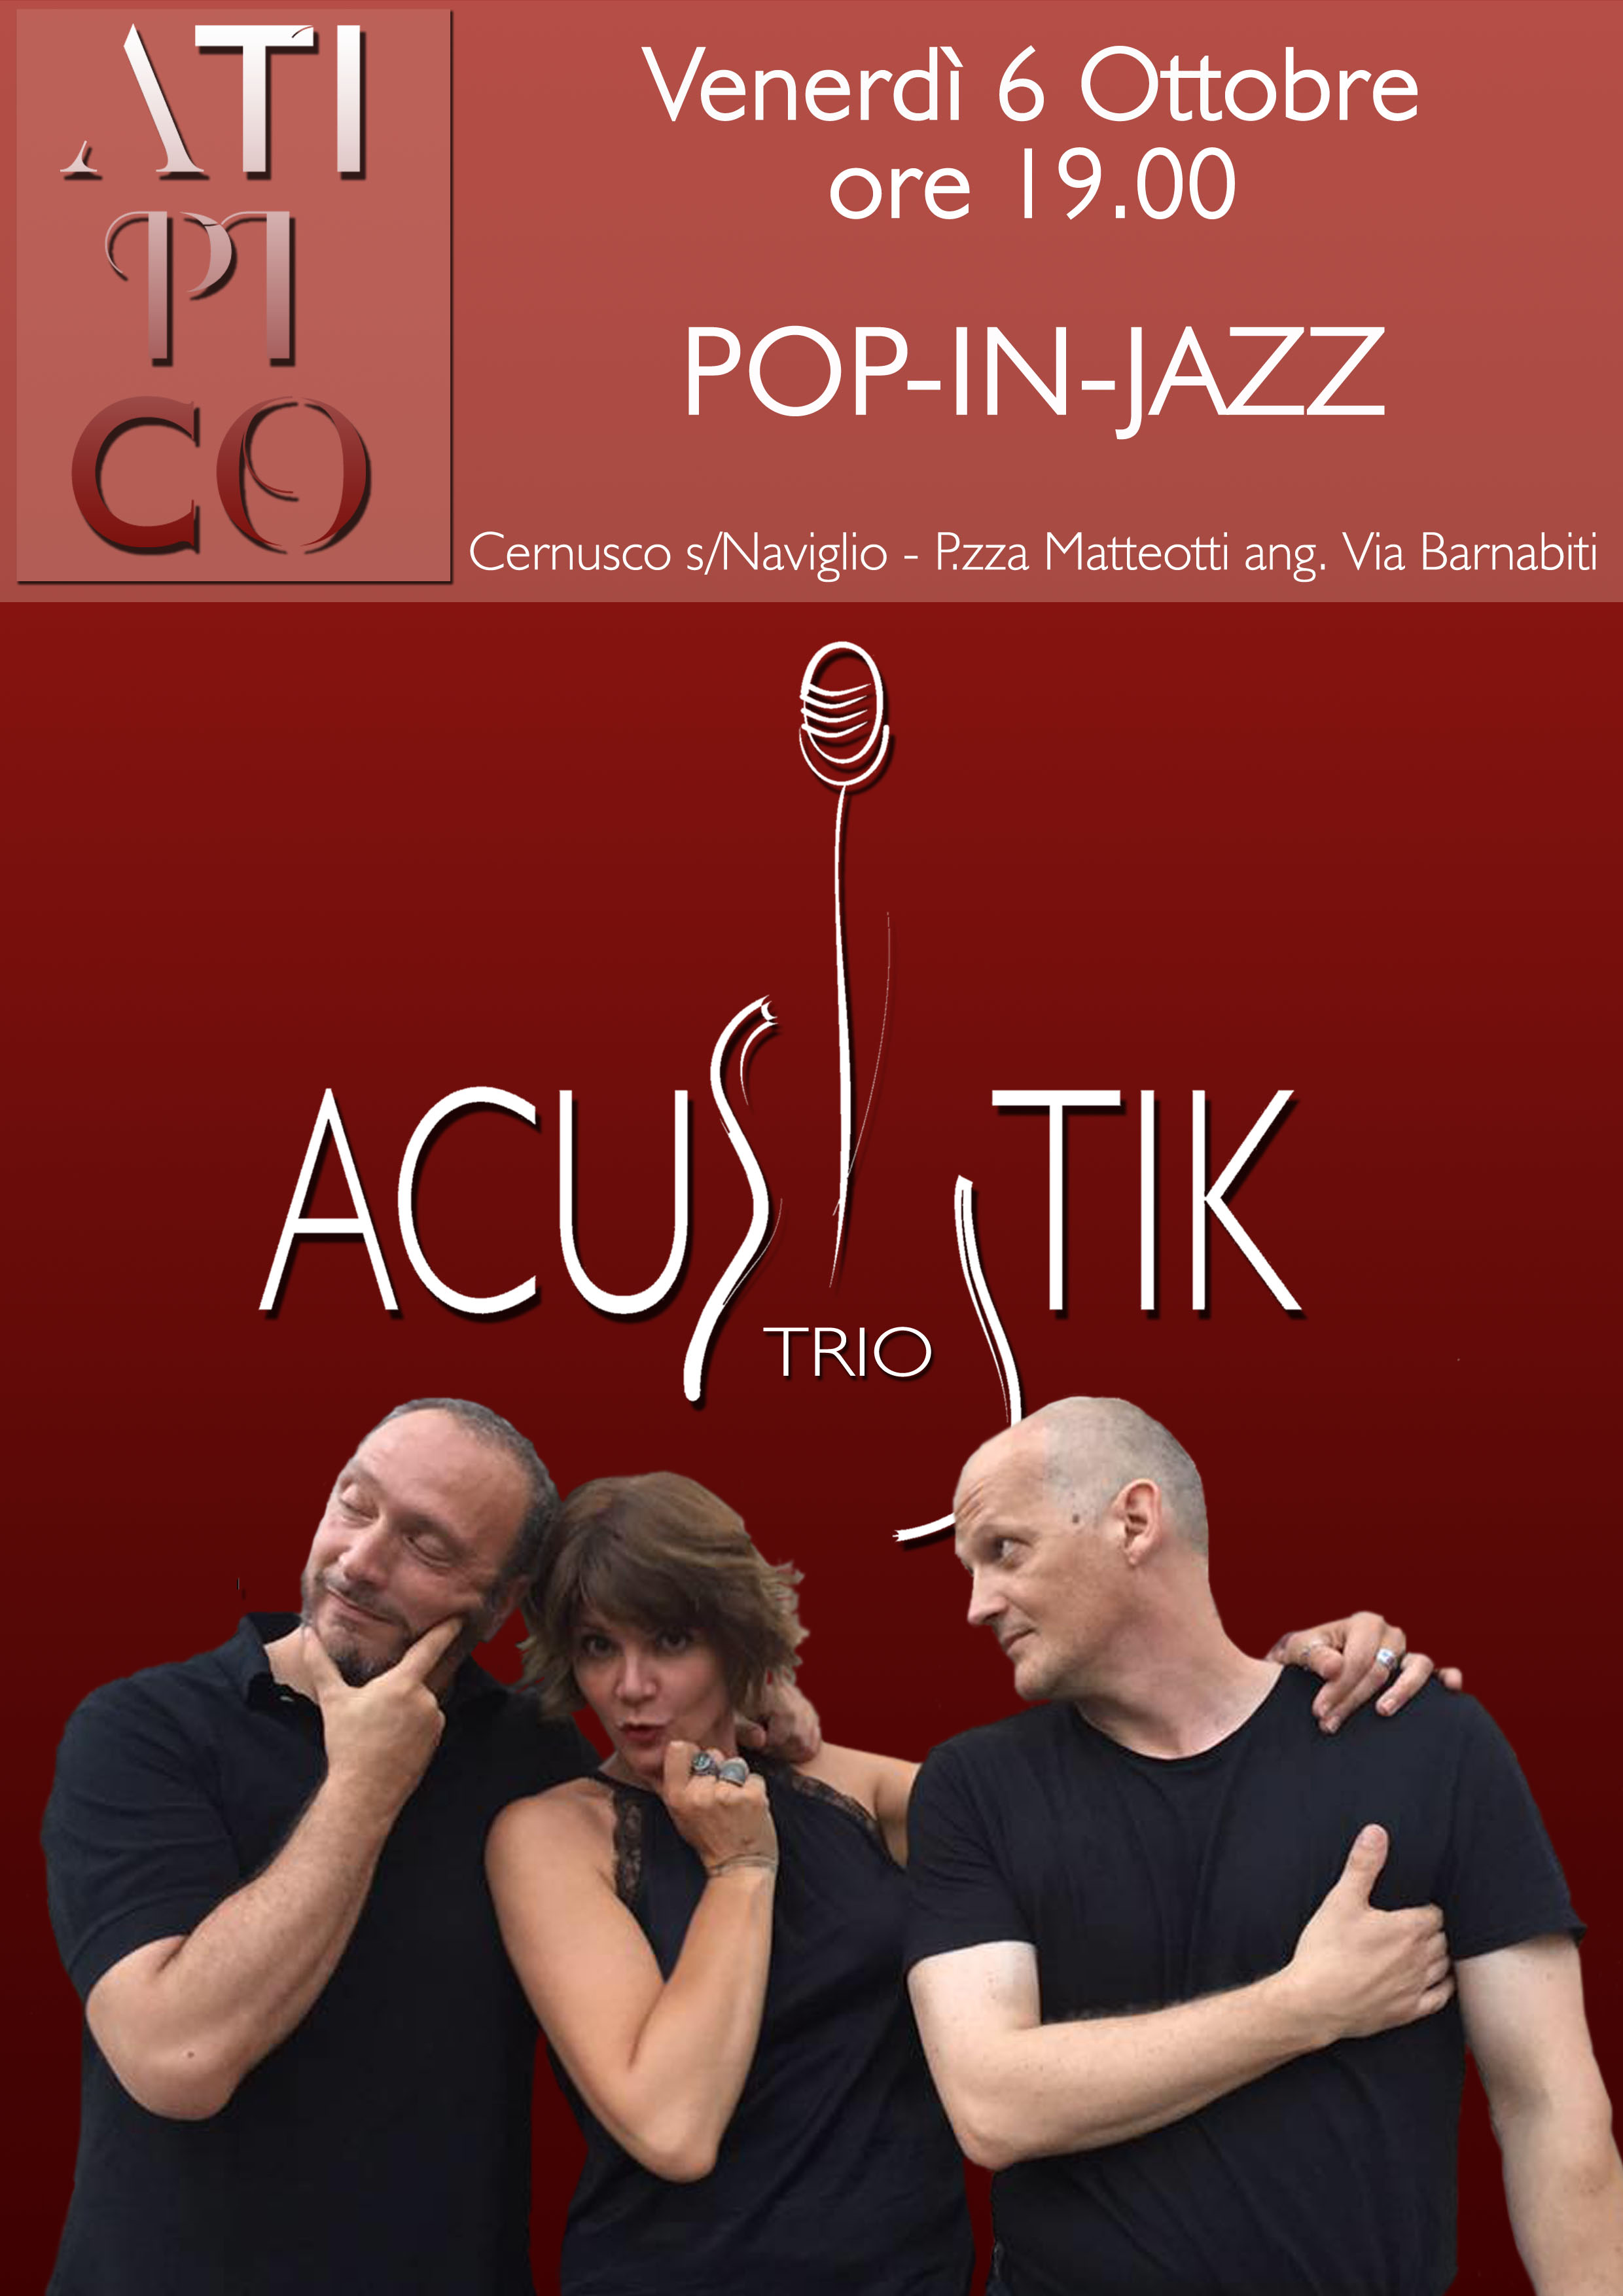 ACUSTIK Trio @ Atipico 2.0